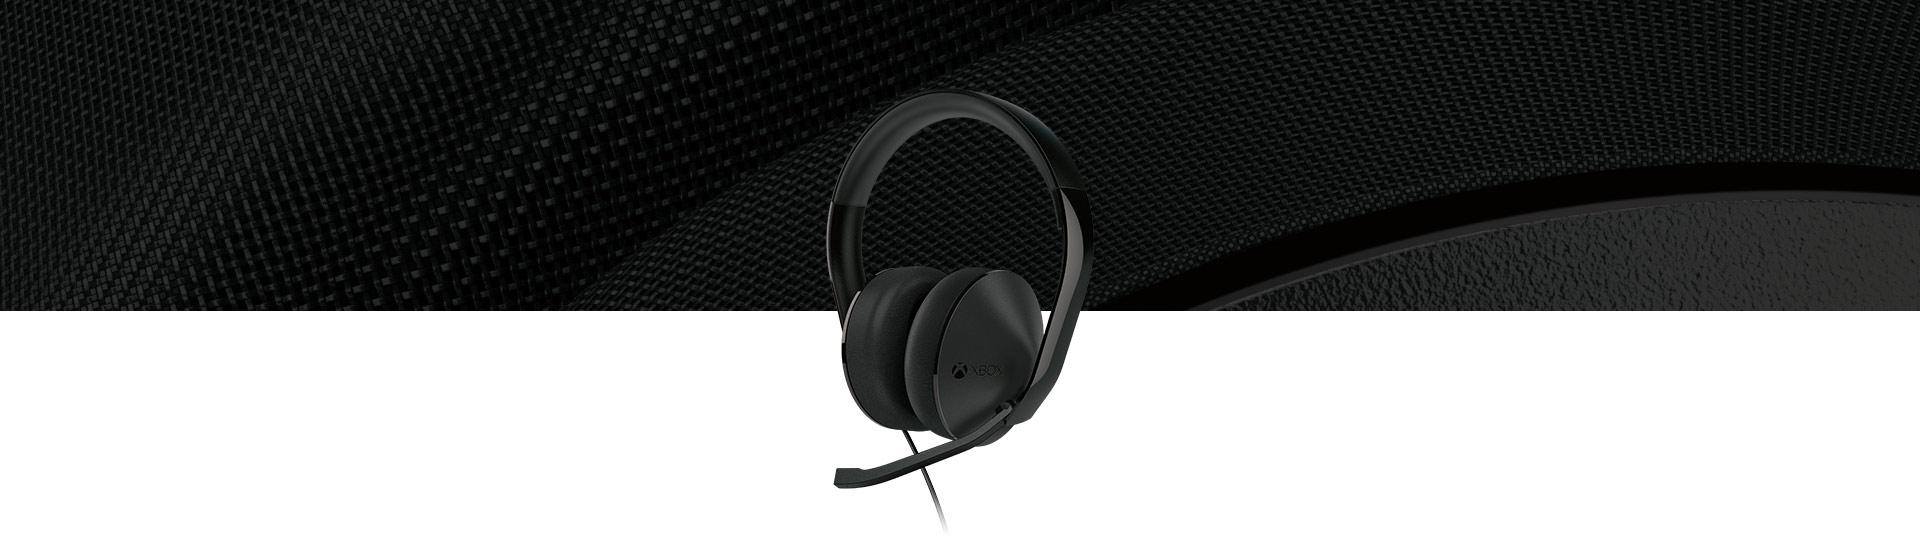 medium resolution of xbox one stereo headset